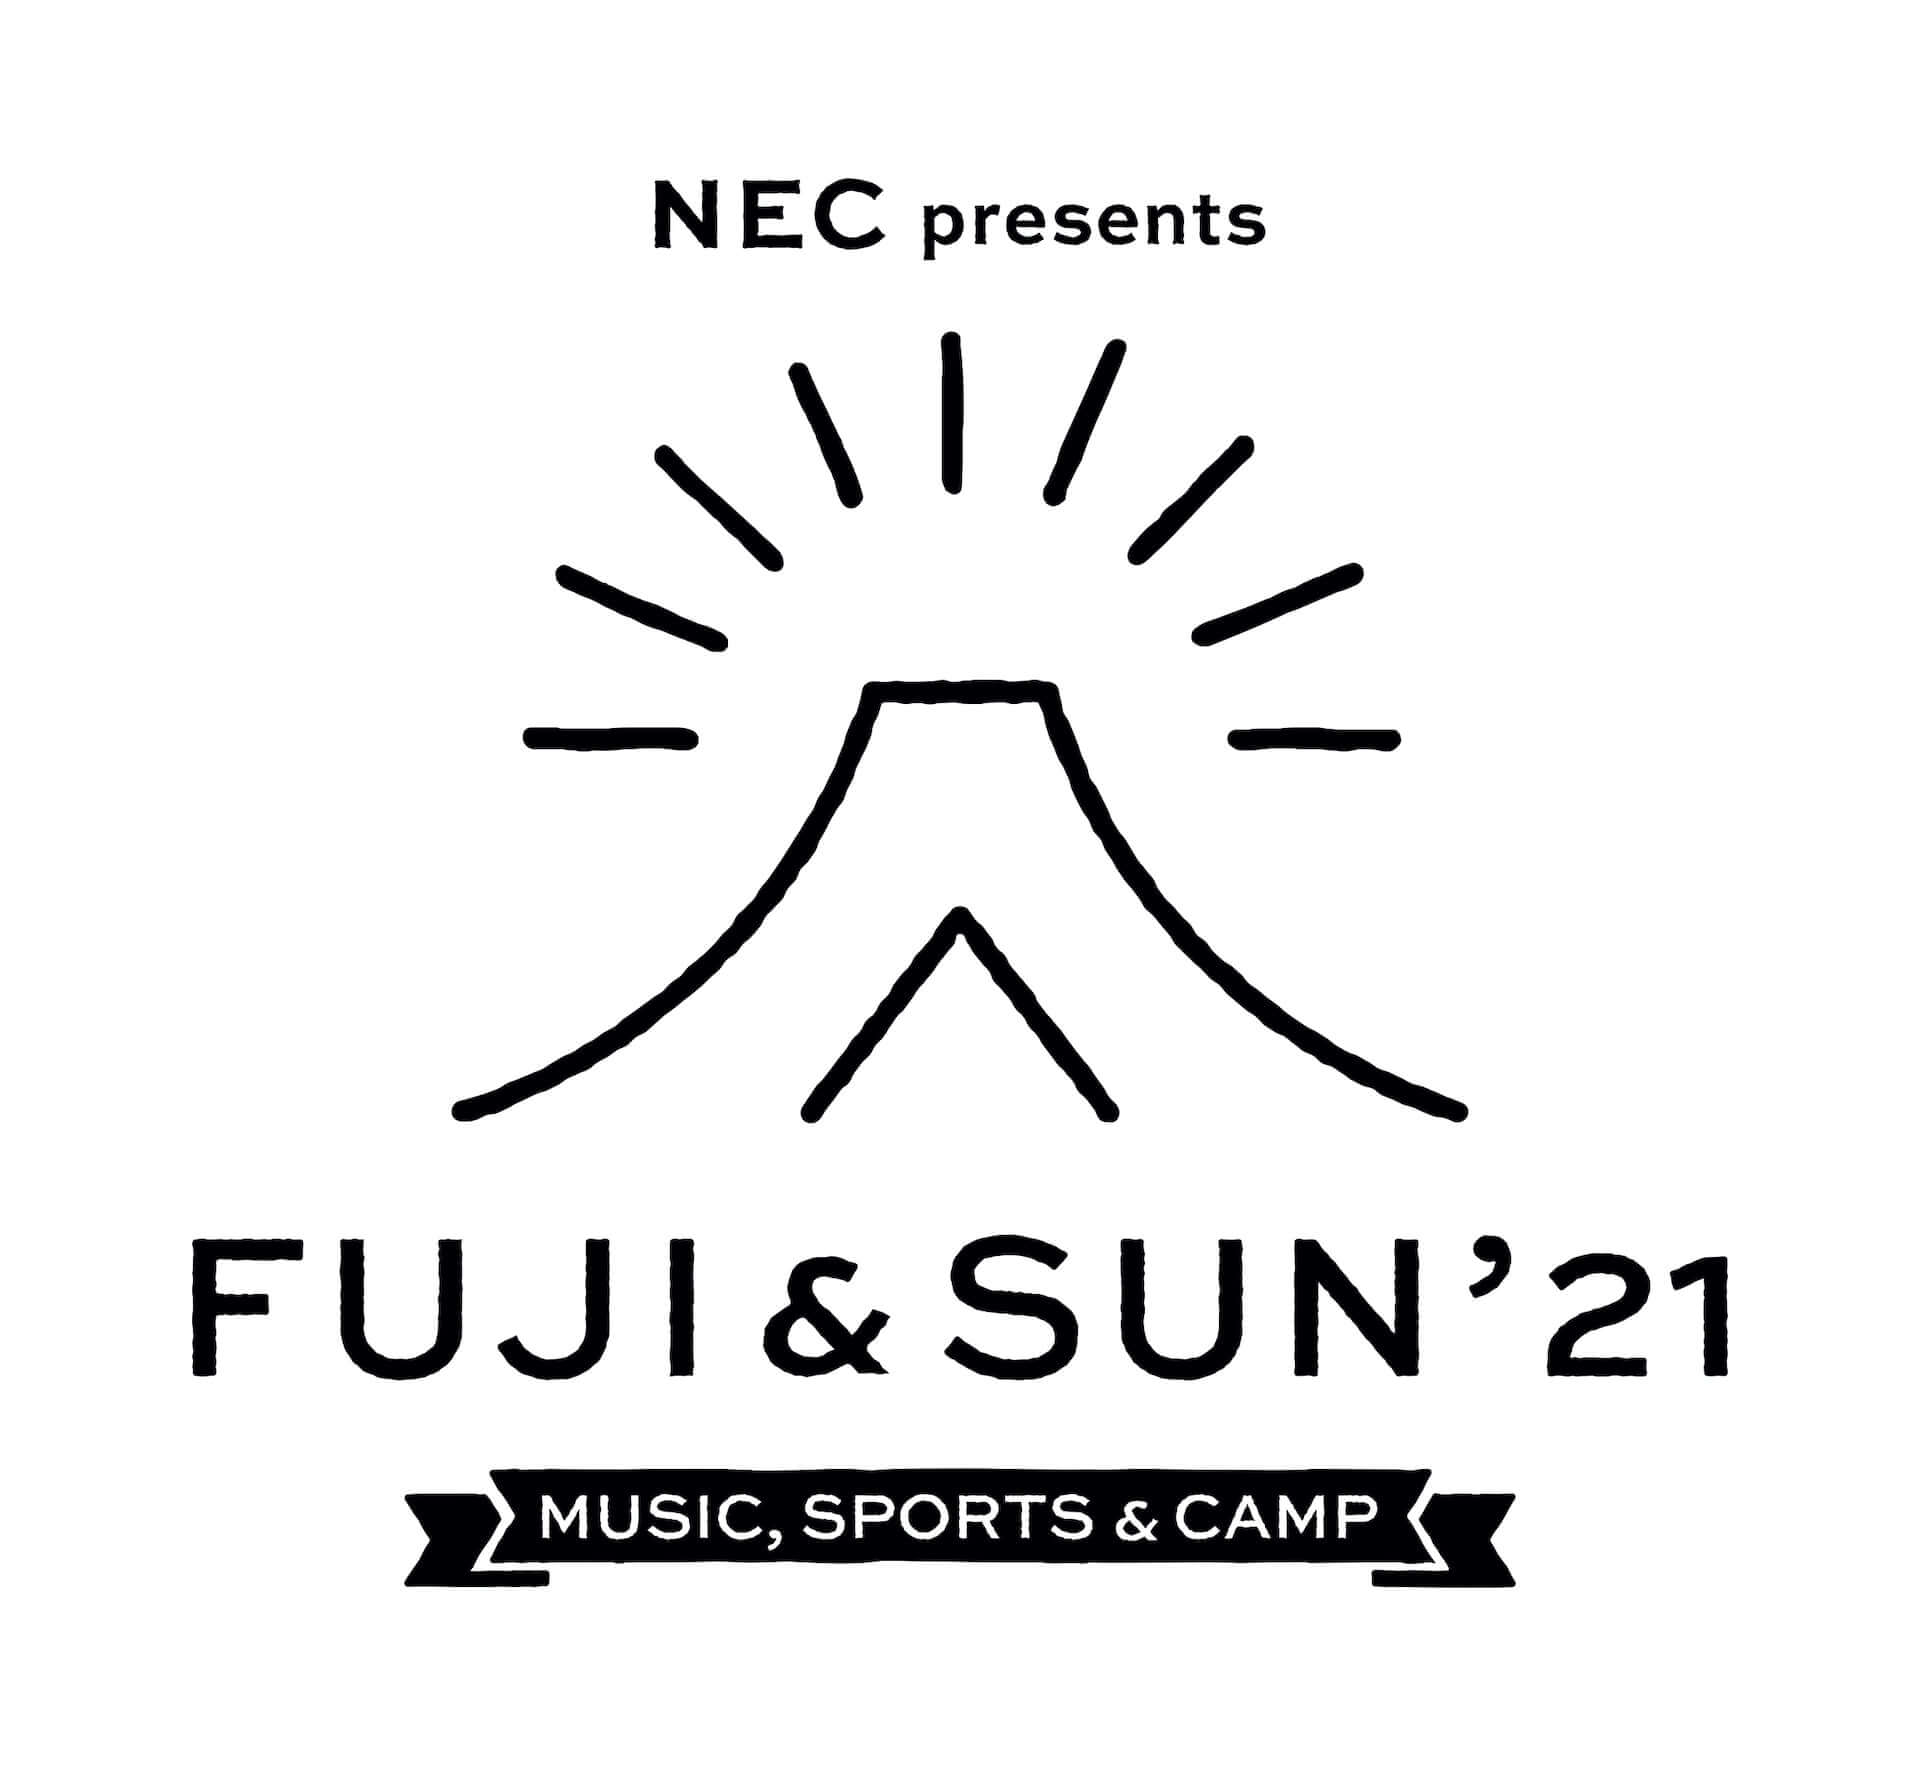 <FUJI & SUN '21>ヘッドライナーにくるりが登場!第3弾出演アーティスト&アクティビティ・コンテンツが発表 music210330_fuji-sun_8-1920x1766